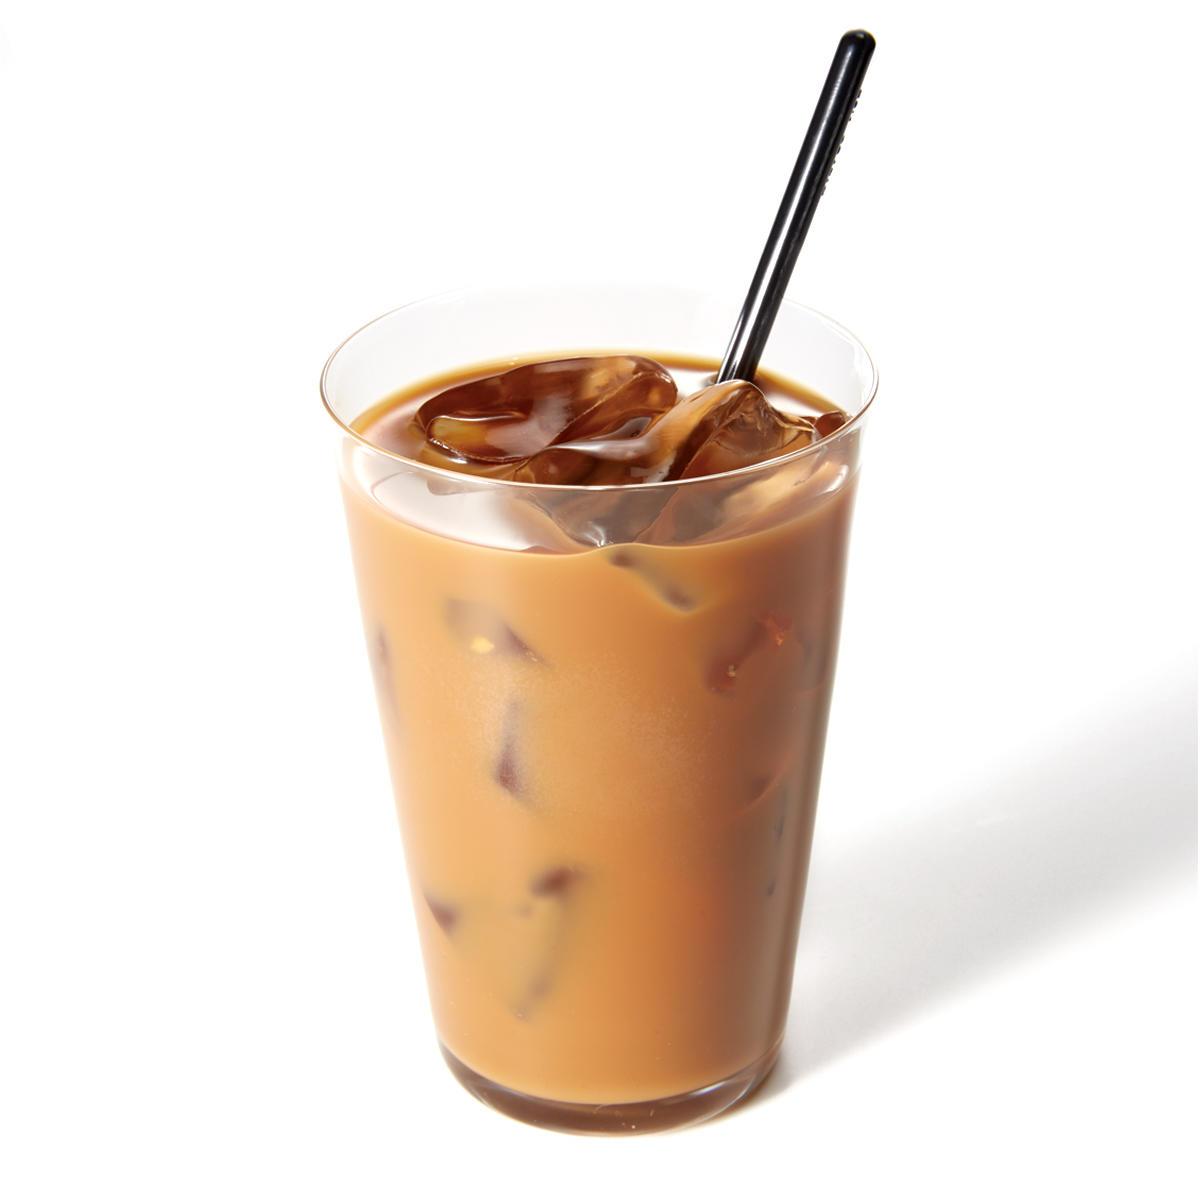 icedcoffee2020_33.jpg